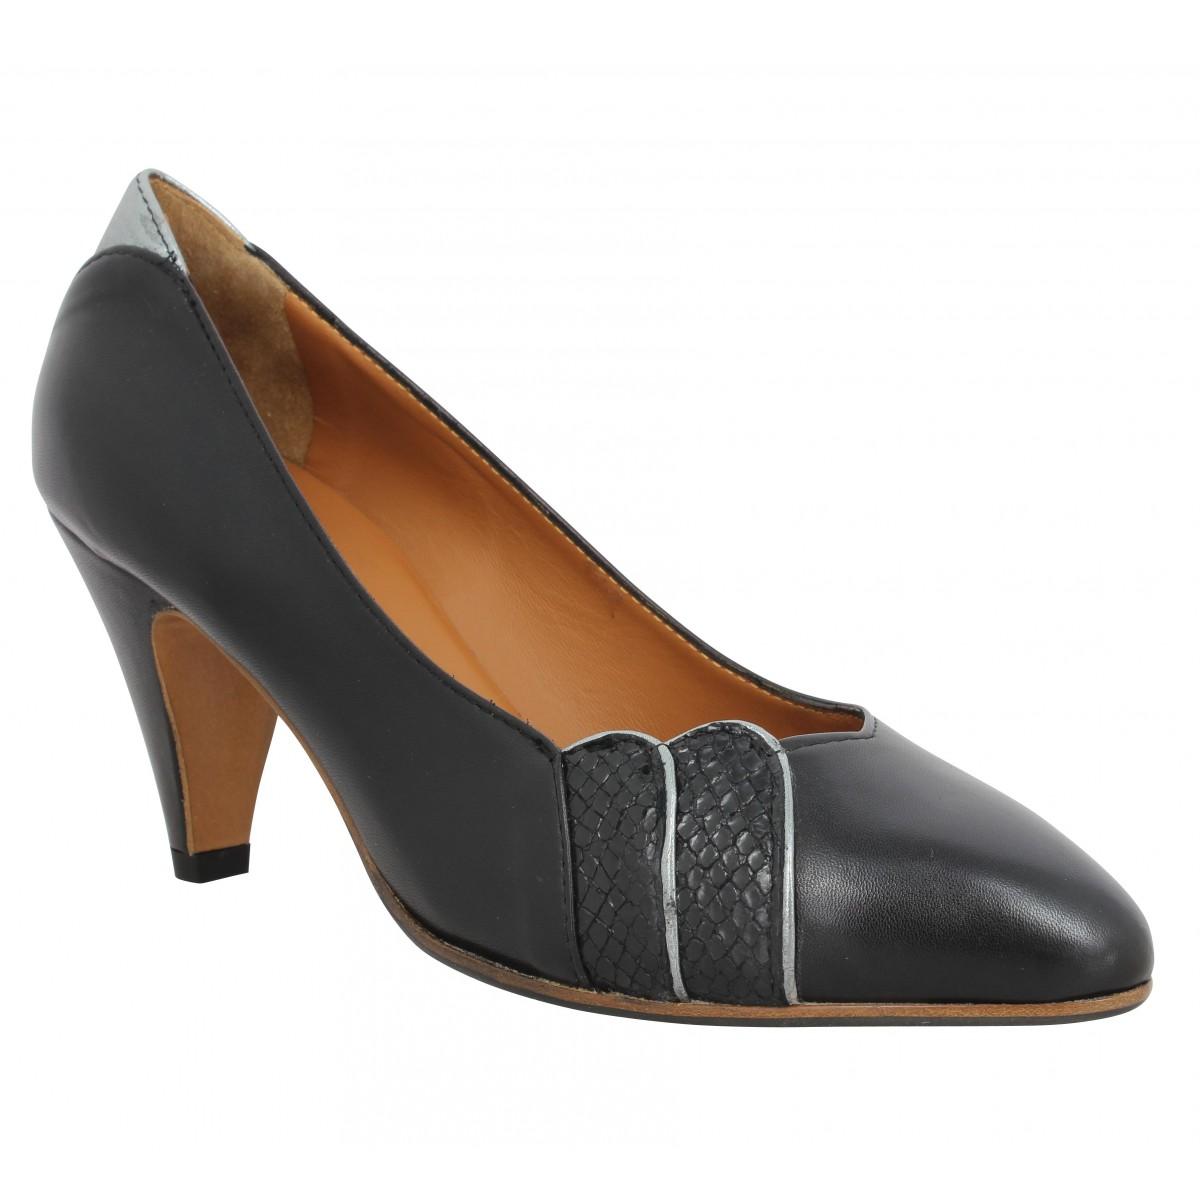 Escarpins LES VENUES 4318 cuir Femme Noir